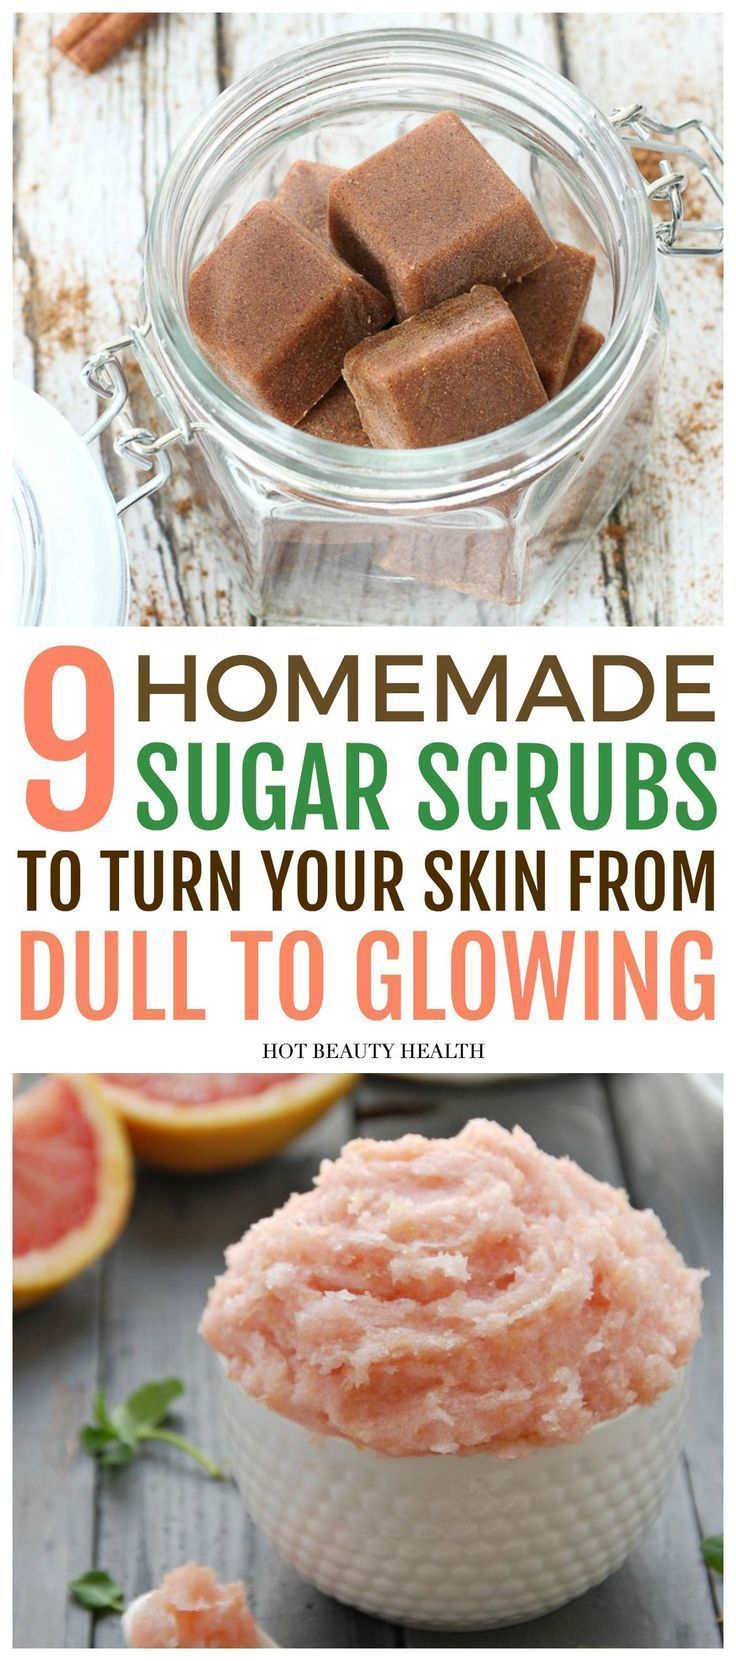 9 Easy DIY sugar scrub recipes for beautiful skin. These homemade body scrubs wi...